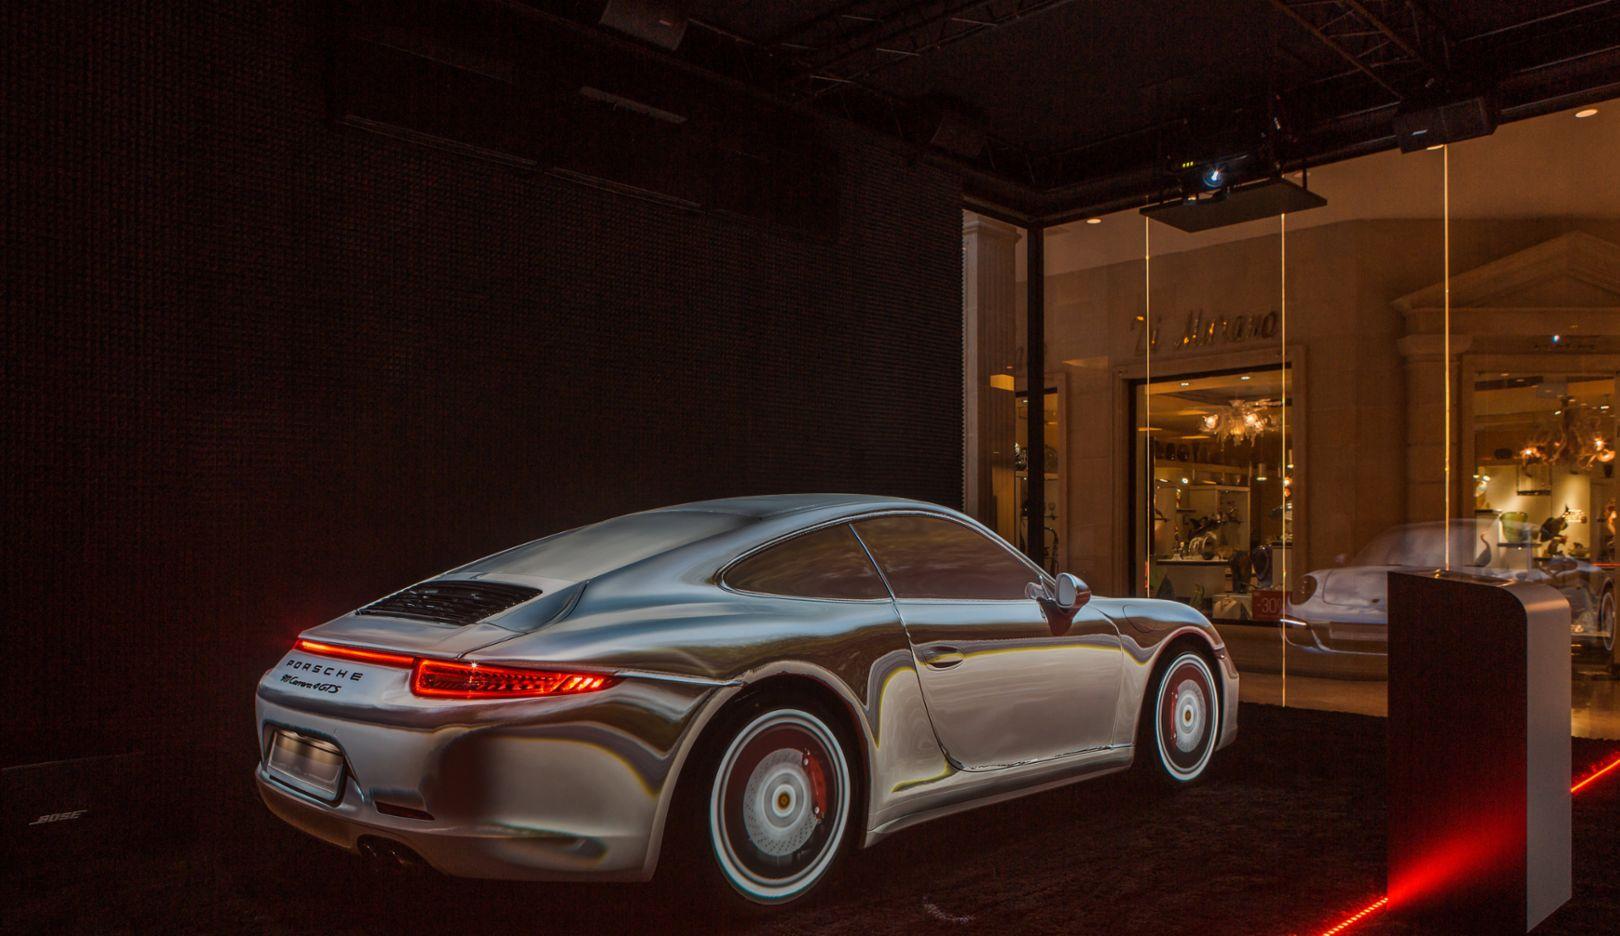 911 Carerra 4 GTS, Moscow, 2015, Porsche AG